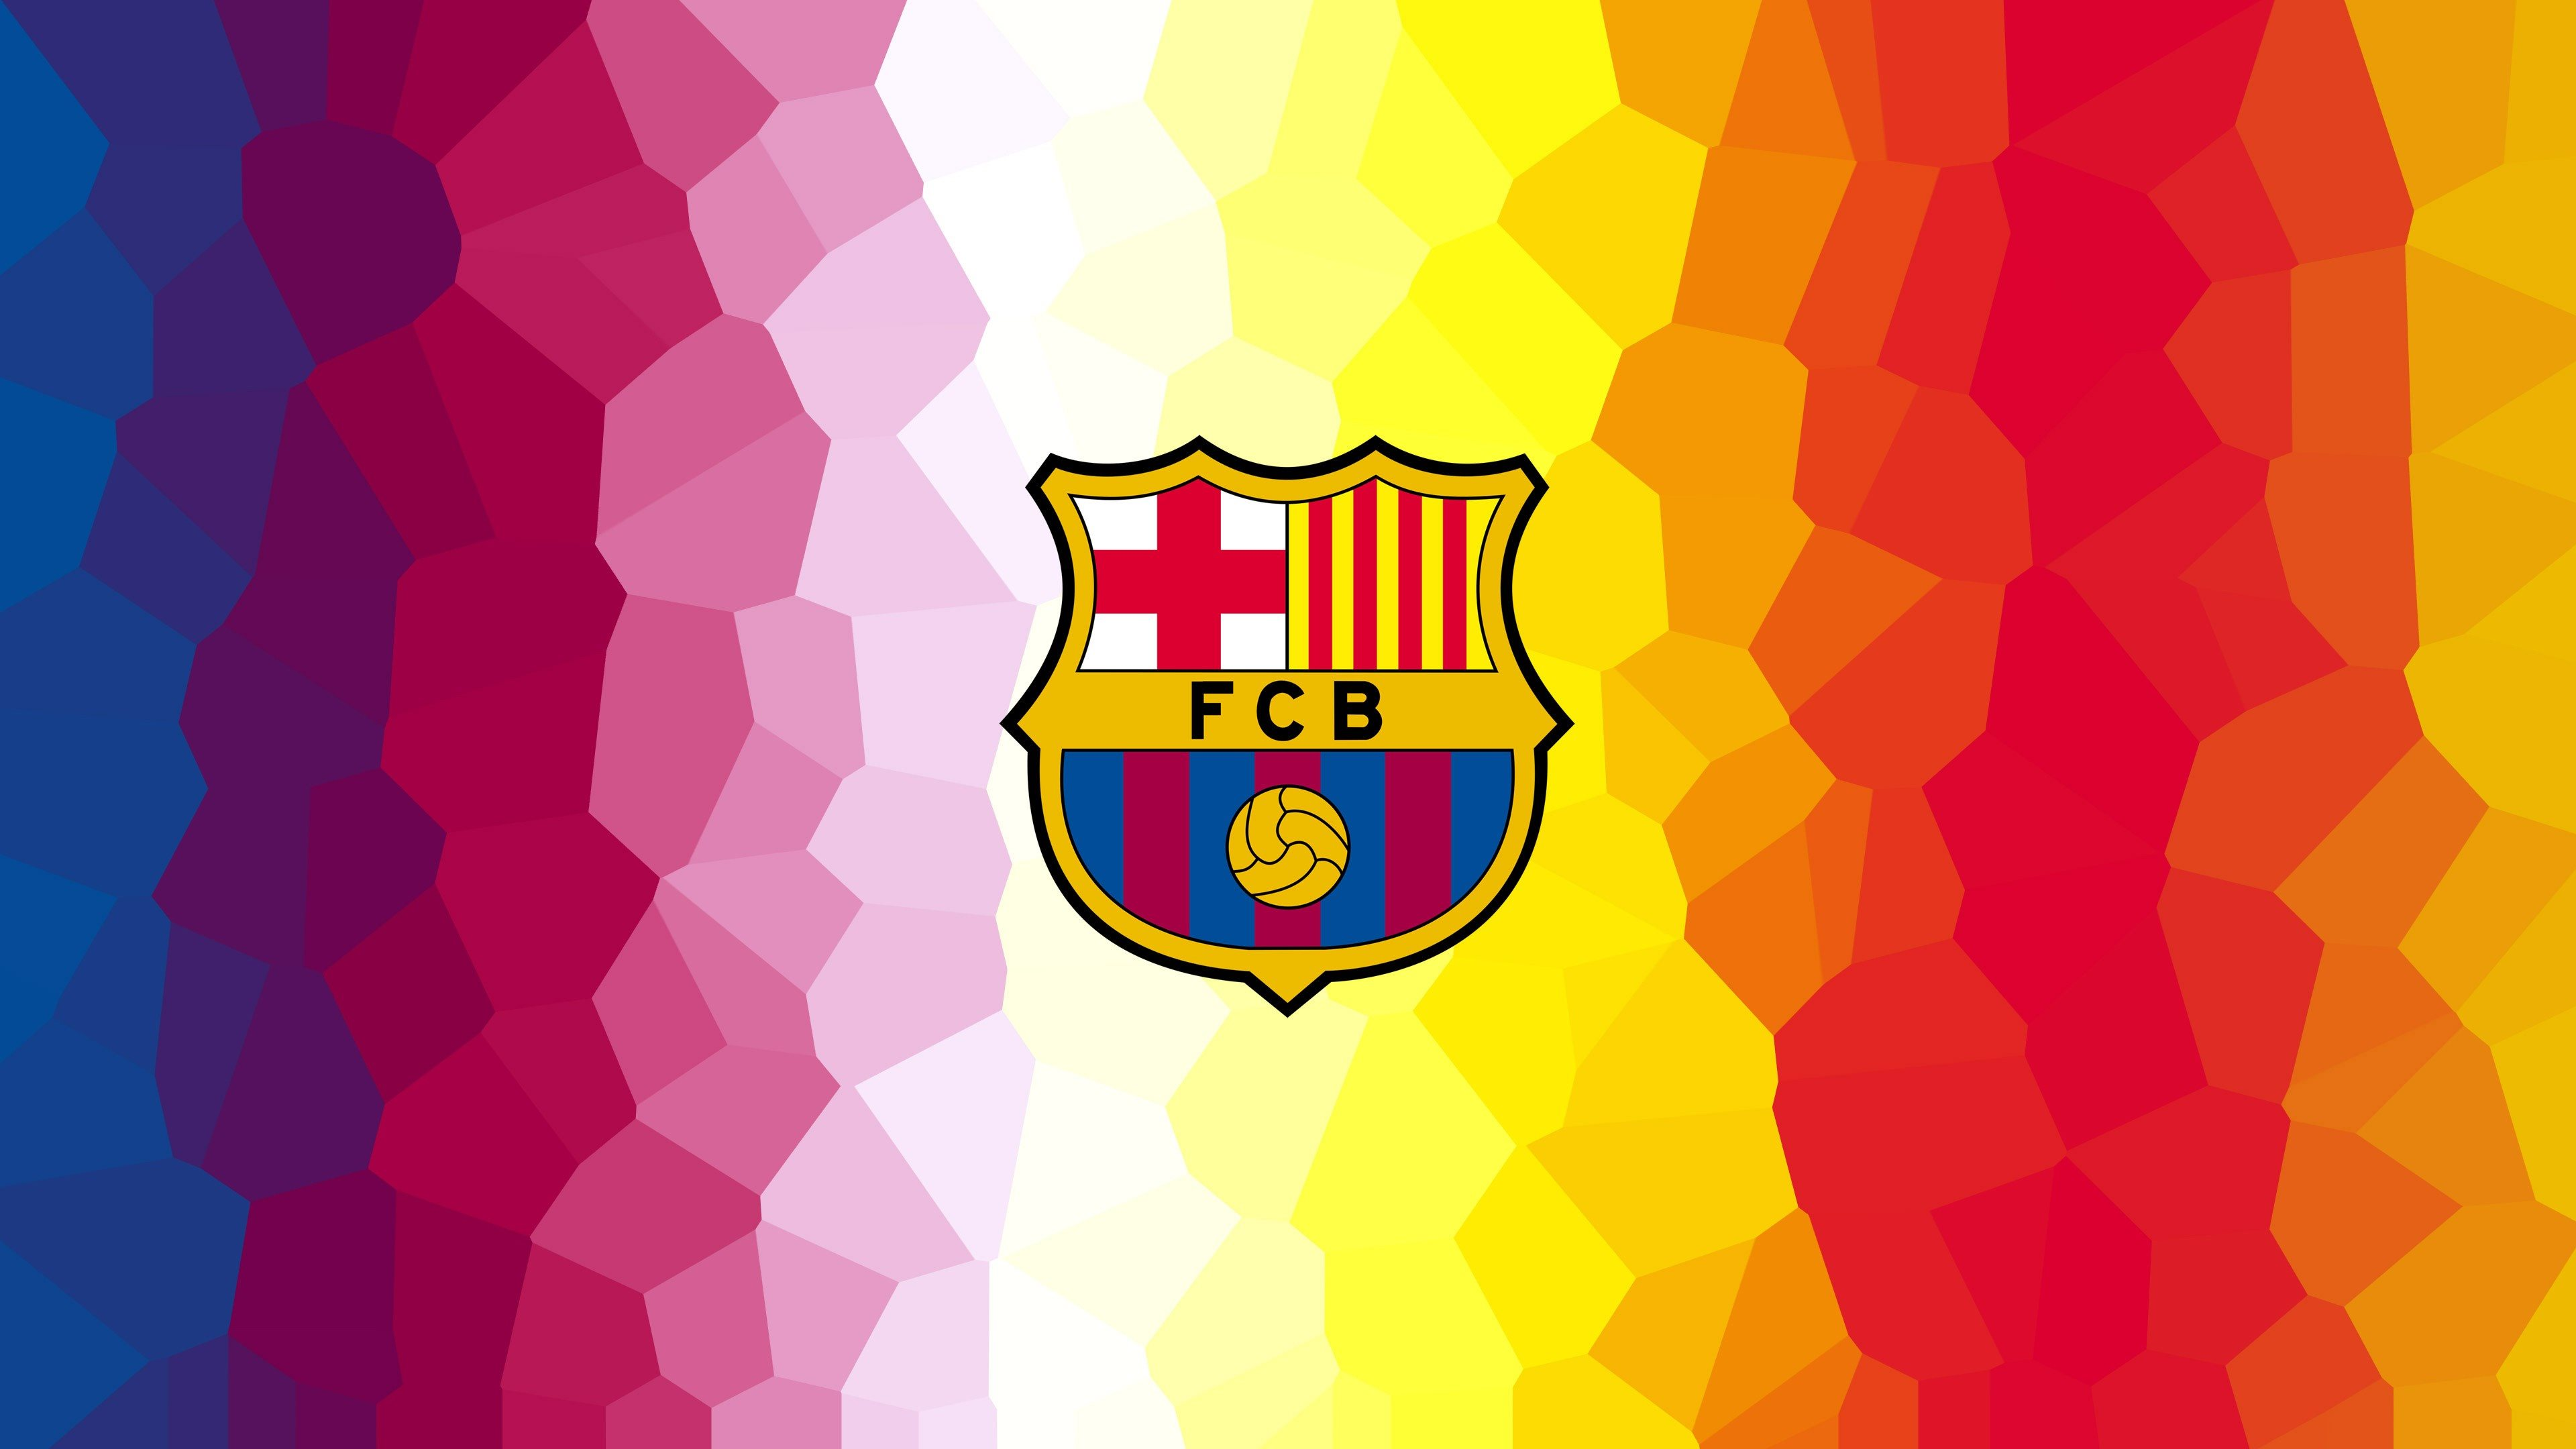 بالصور صور شعار برشلونة , اجمل صور لشعار نادى برشلونه 5547 15